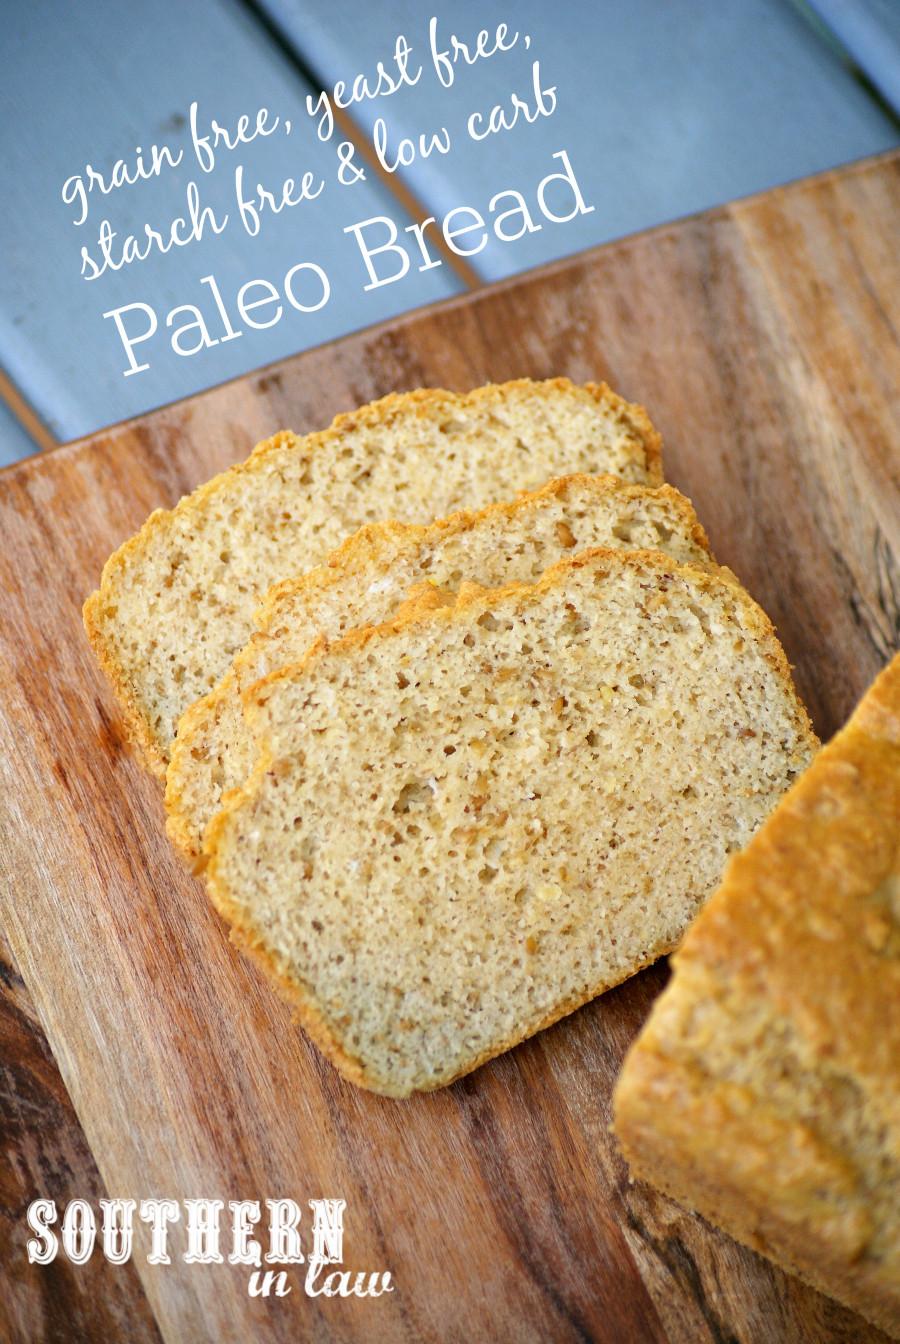 Gluten Free Yeast Bread Recipe  Southern In Law Recipe Starch Yeast & Grain Free Paleo